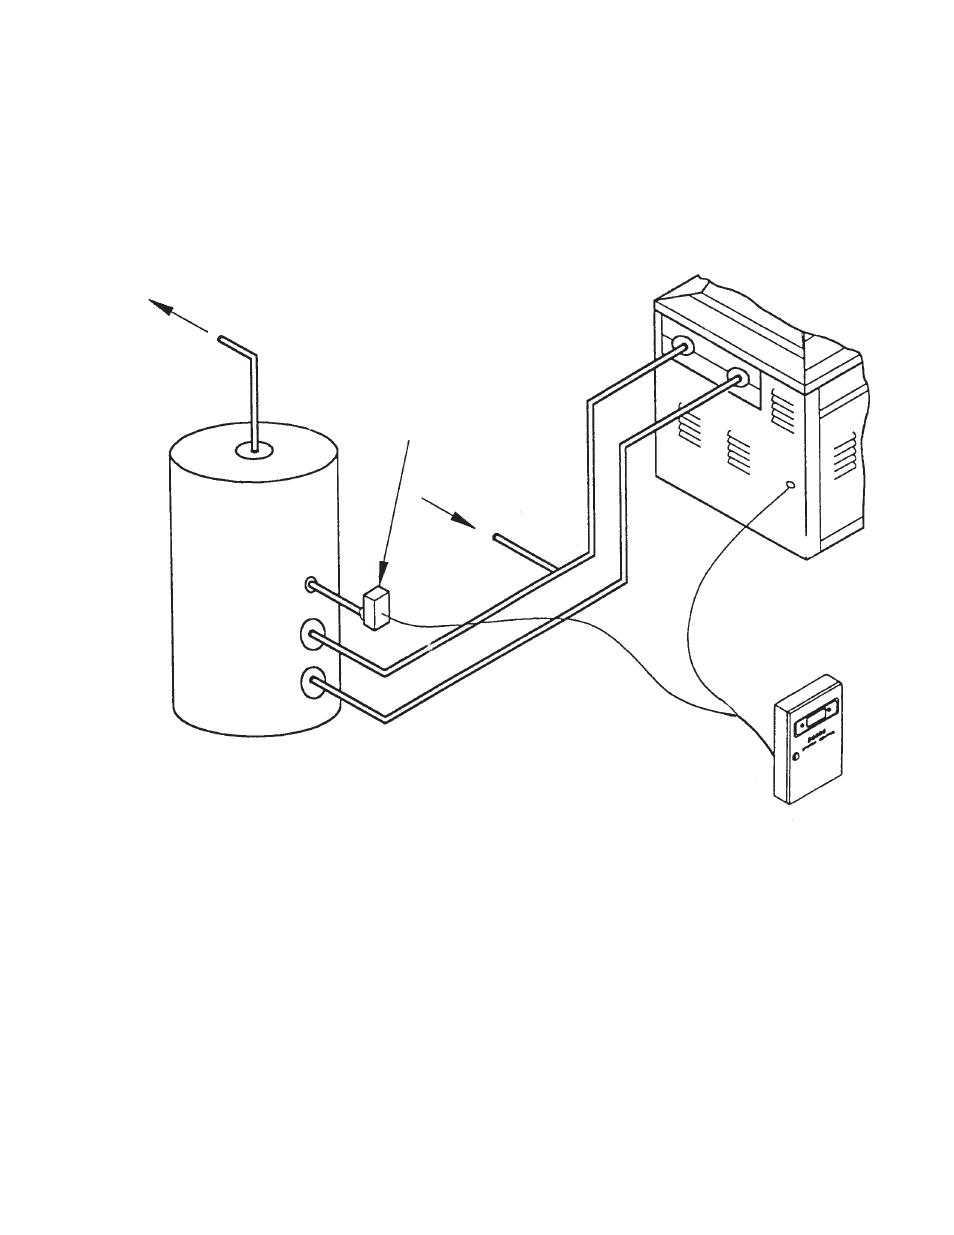 Raypak Storage Tank Piping Diagram Wiring Master Blogs Water Heater B6000 User Manual Page 11 51 Rh Manualsdir Com Wood Boiler With Diagrams Air